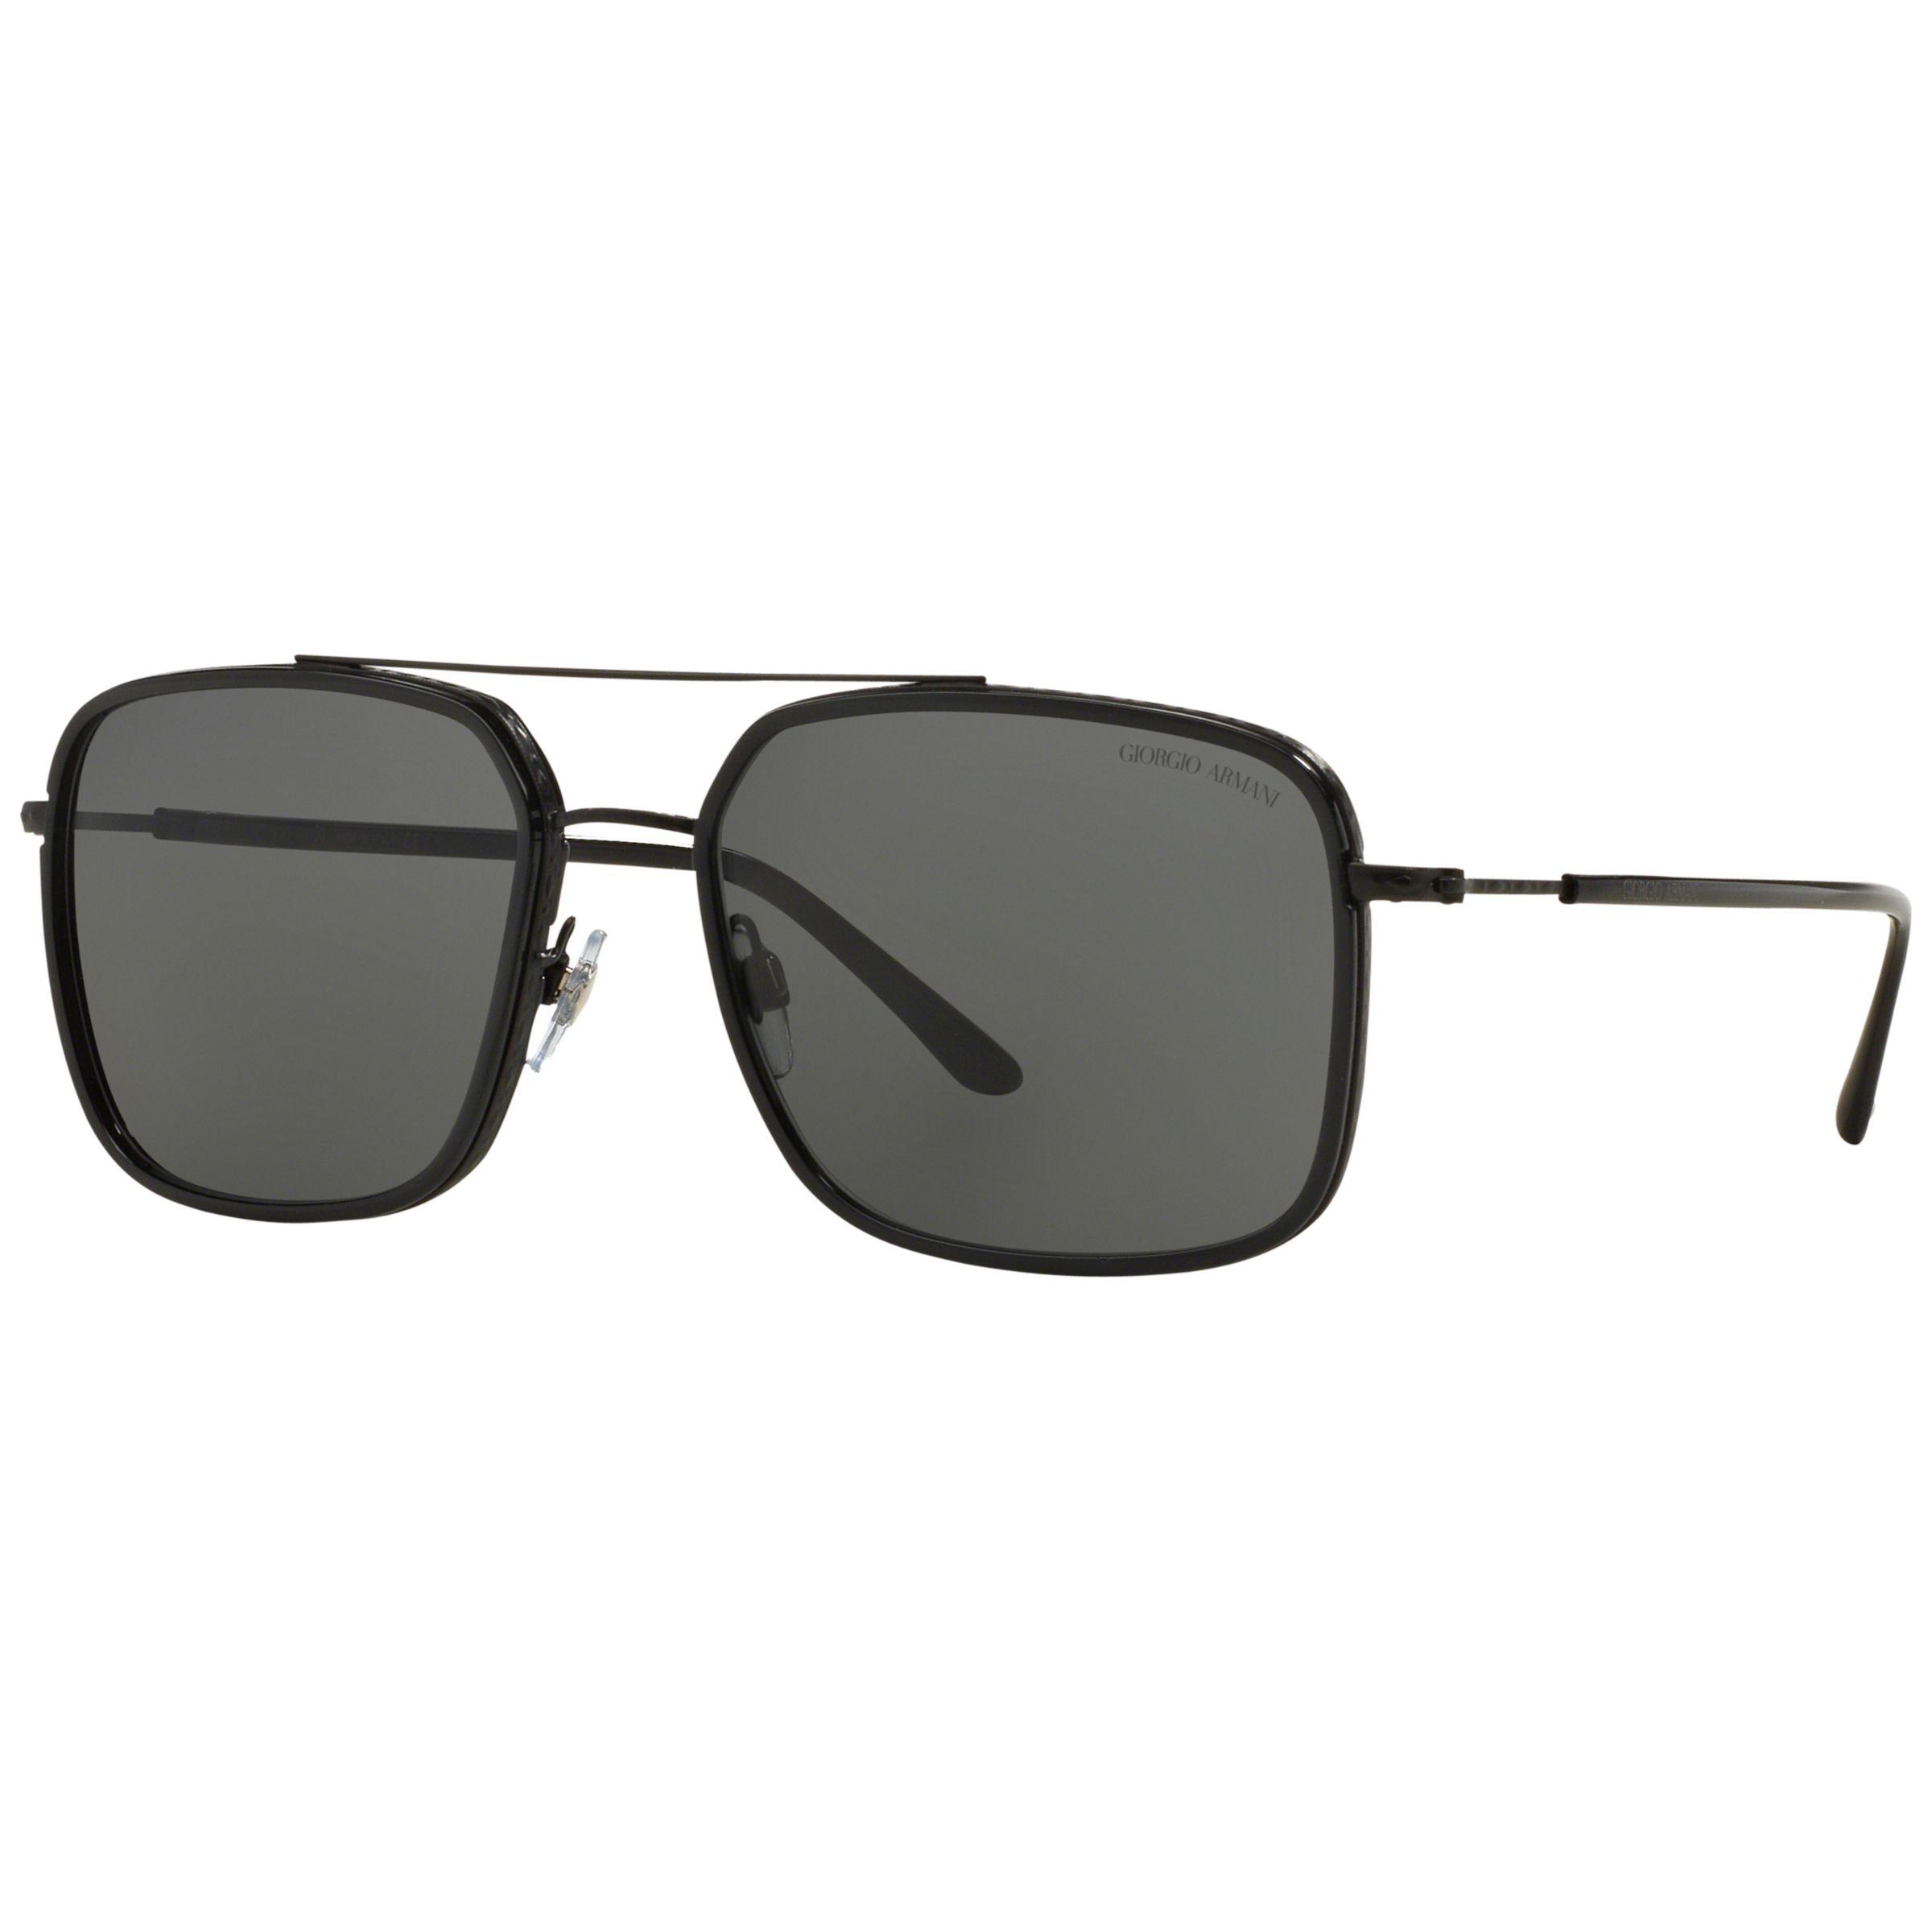 Giorgio Armani Giorgio Armani AR6031 Square Sunglasses, Black